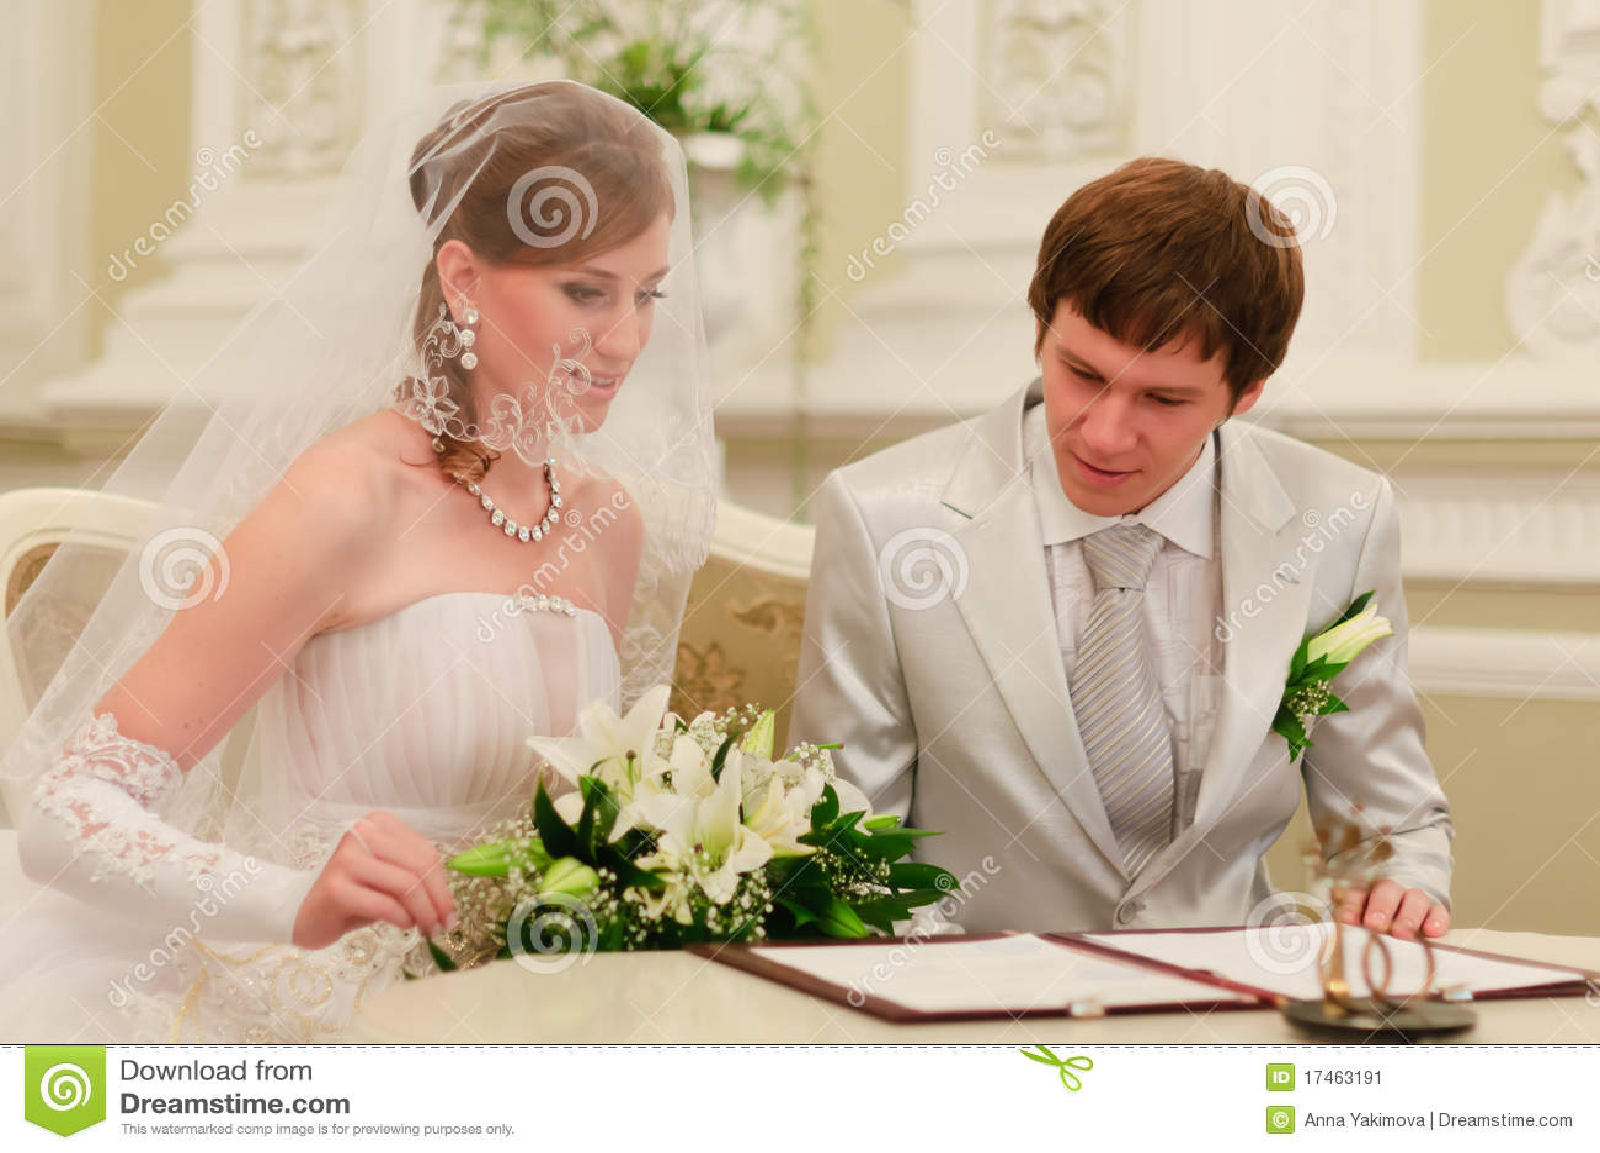 couple sign wedding register stock image image of document girl